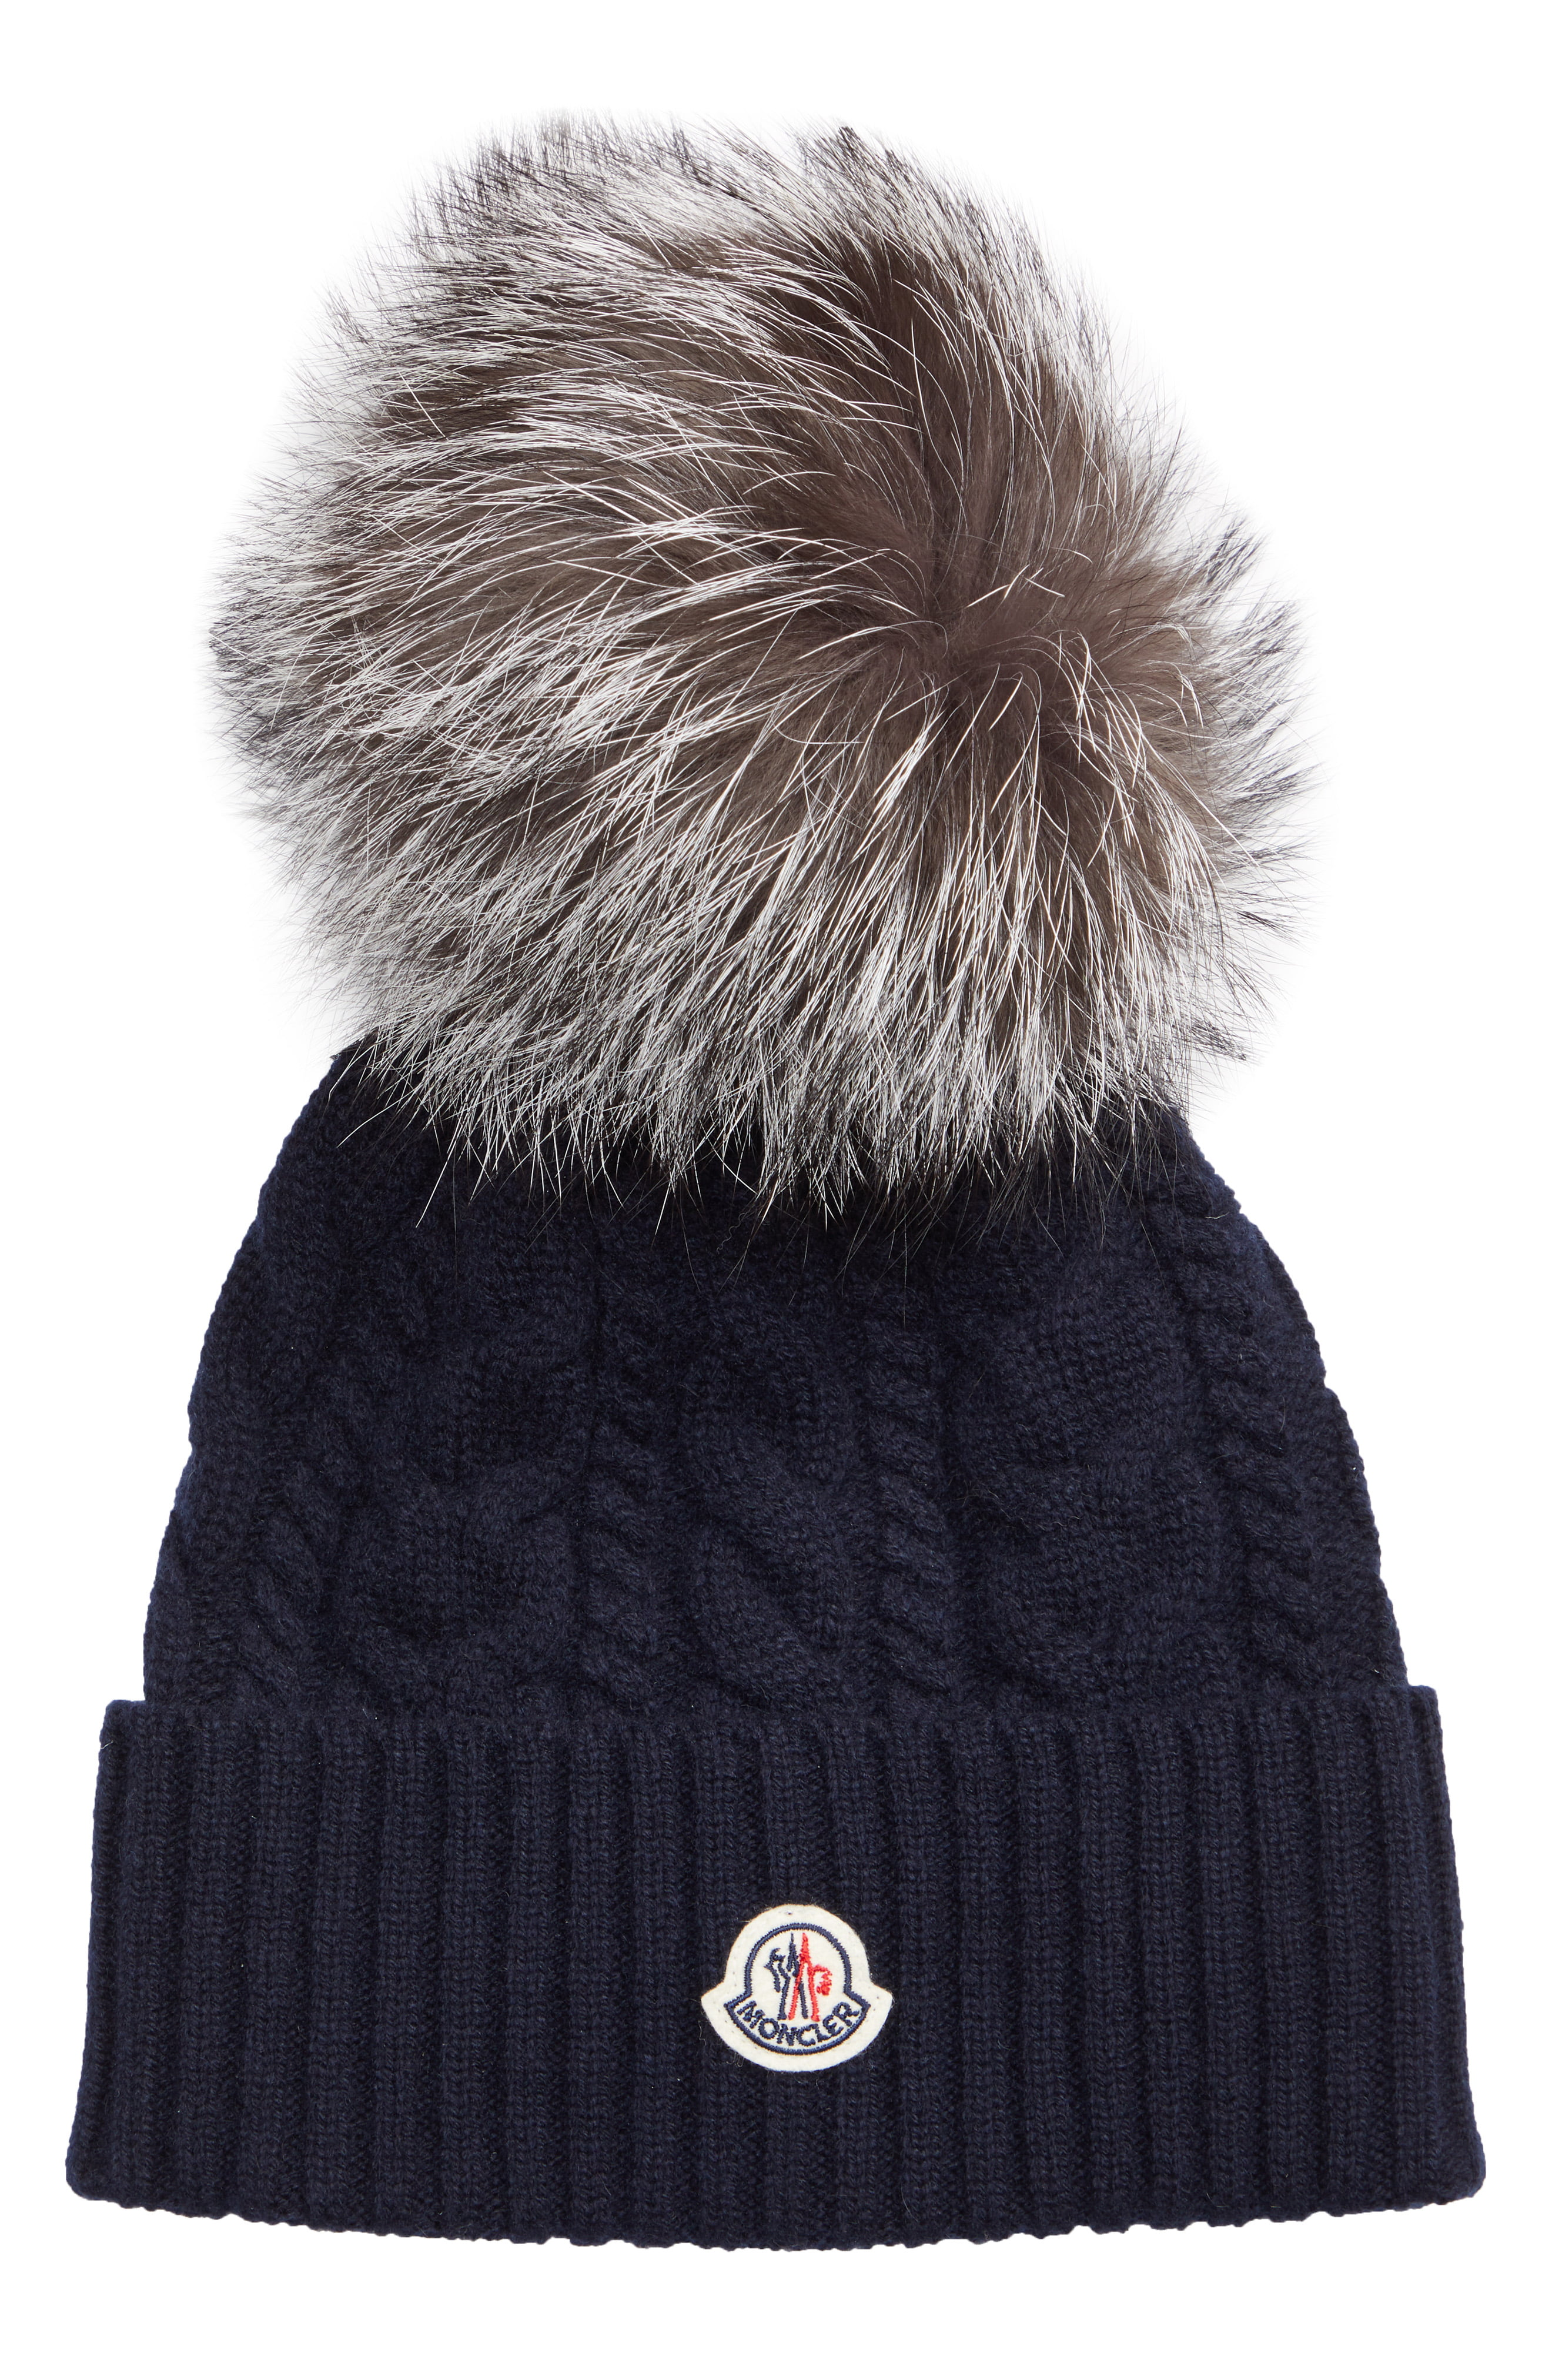 Women's Moncler Genuine Fox Fur Pom Wool Beanie Blue